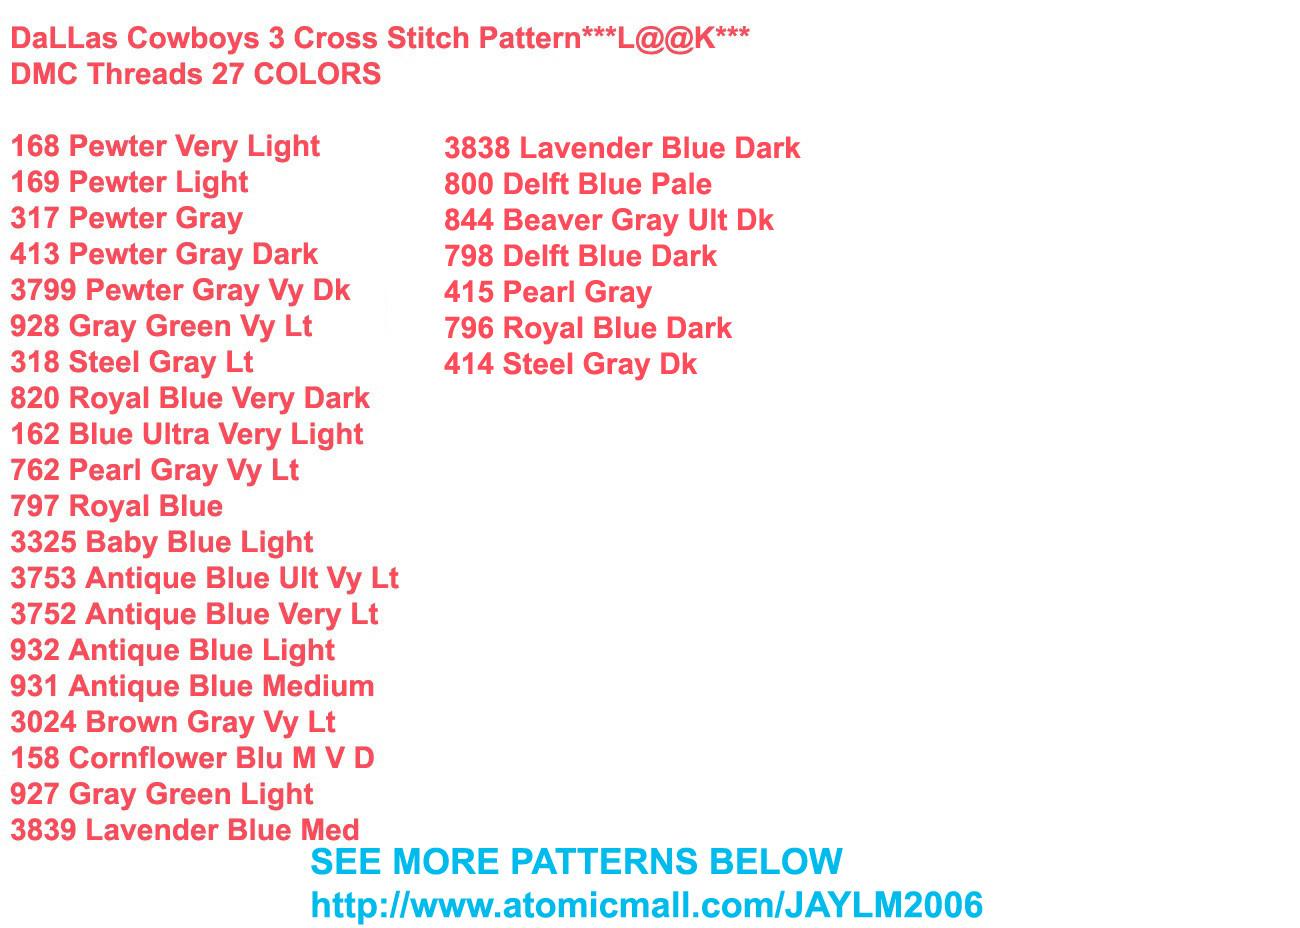 DaLLas Cowboys 3 Cross Stitch Pattern***L@@K***